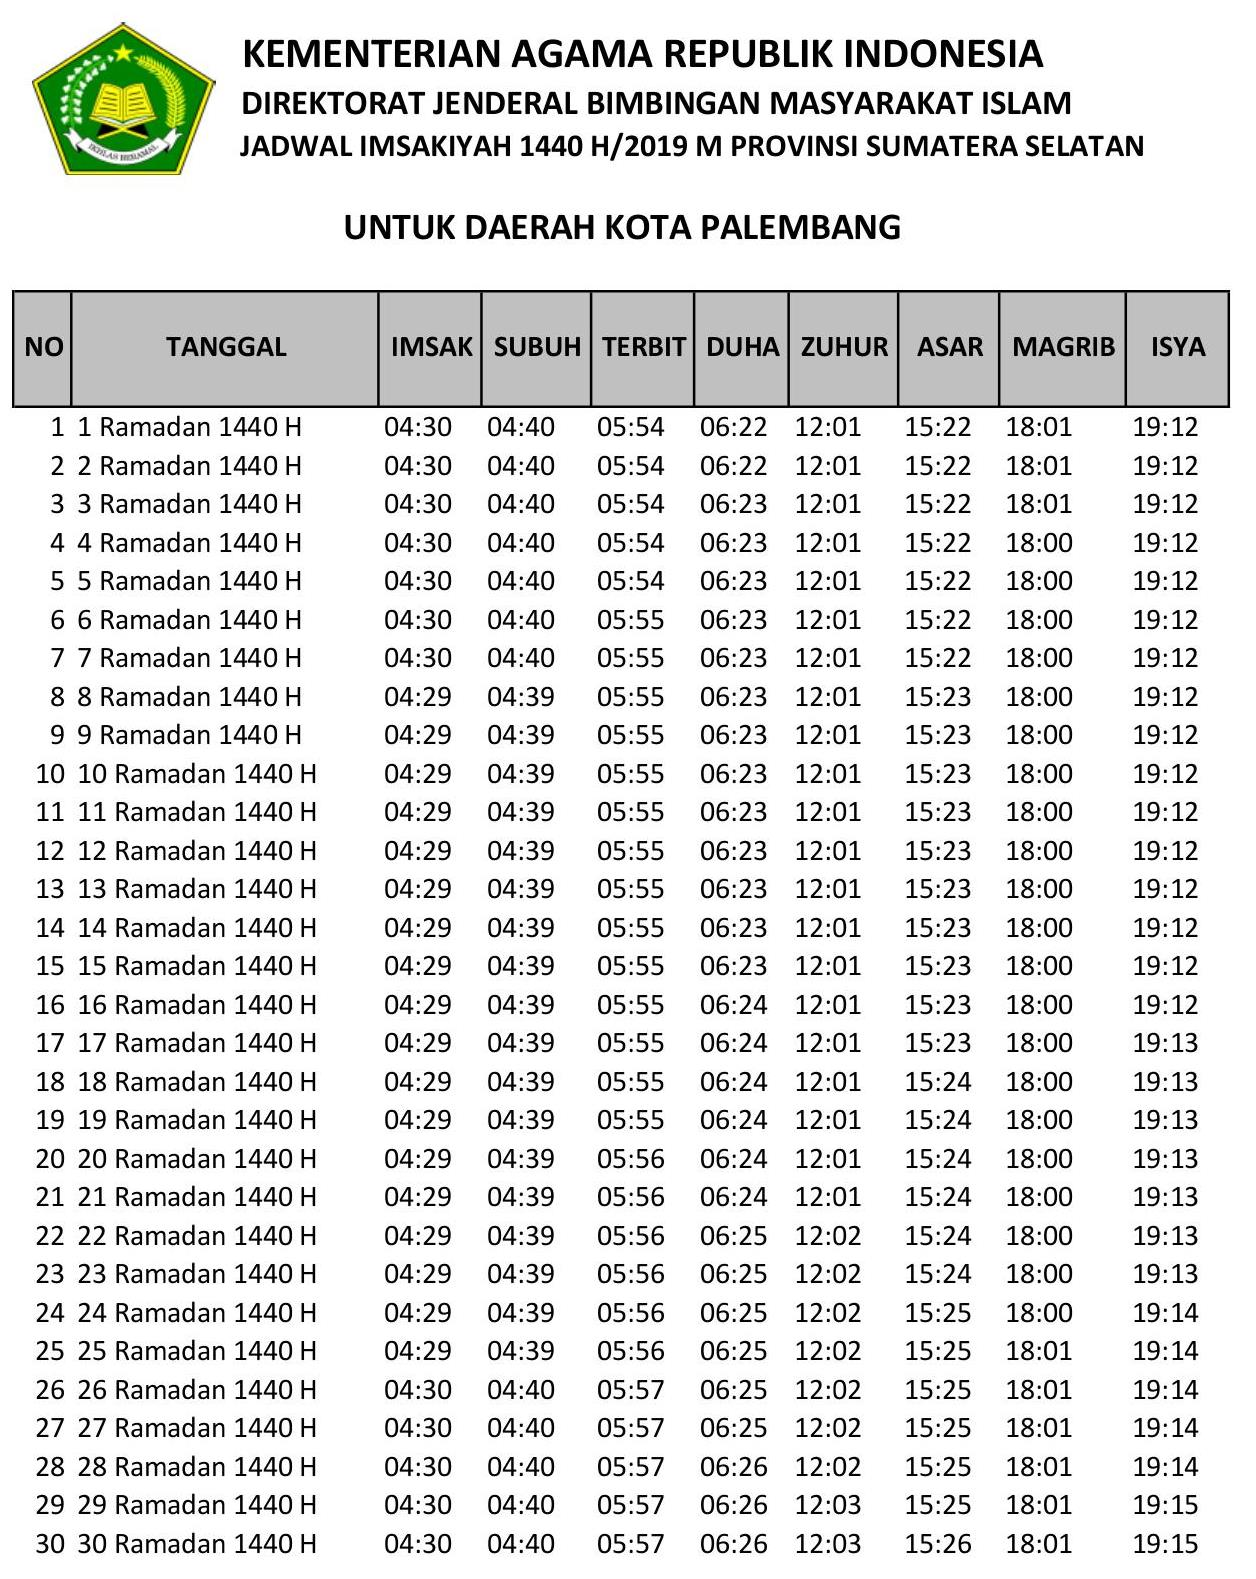 Jadwal Sholat Palembang-Ramadhan 2019-Waktu Maghrib, Waktu Imsak, dan Waktu Shubuh di Wilayah Kota Palembang dan Sekitarnya, Sumatera Selatan-Bulan Puasa 2019-1440 Hijriyah.